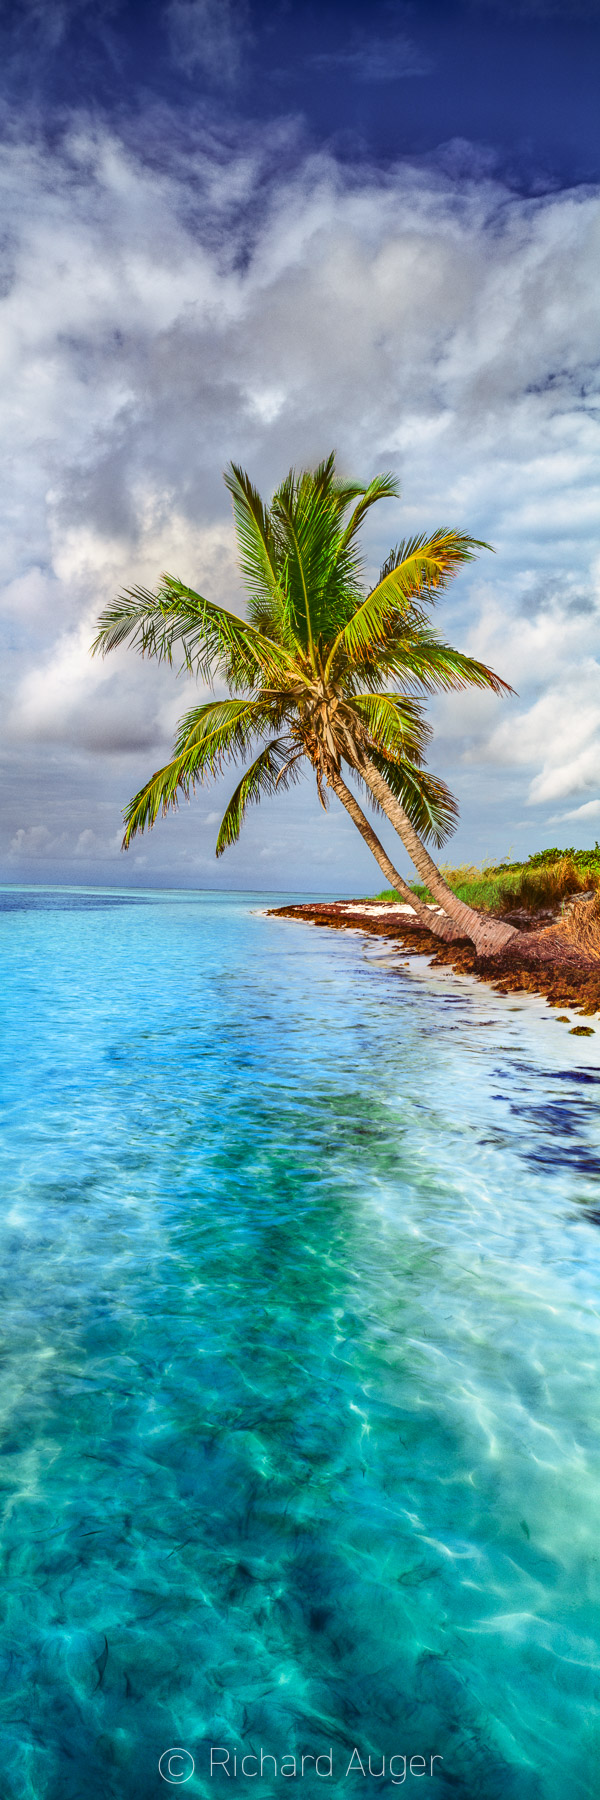 Bahia Honda State Park, Florida Keys, Palm Trees, Morning, Vertical Panorama, Fluorescent Water